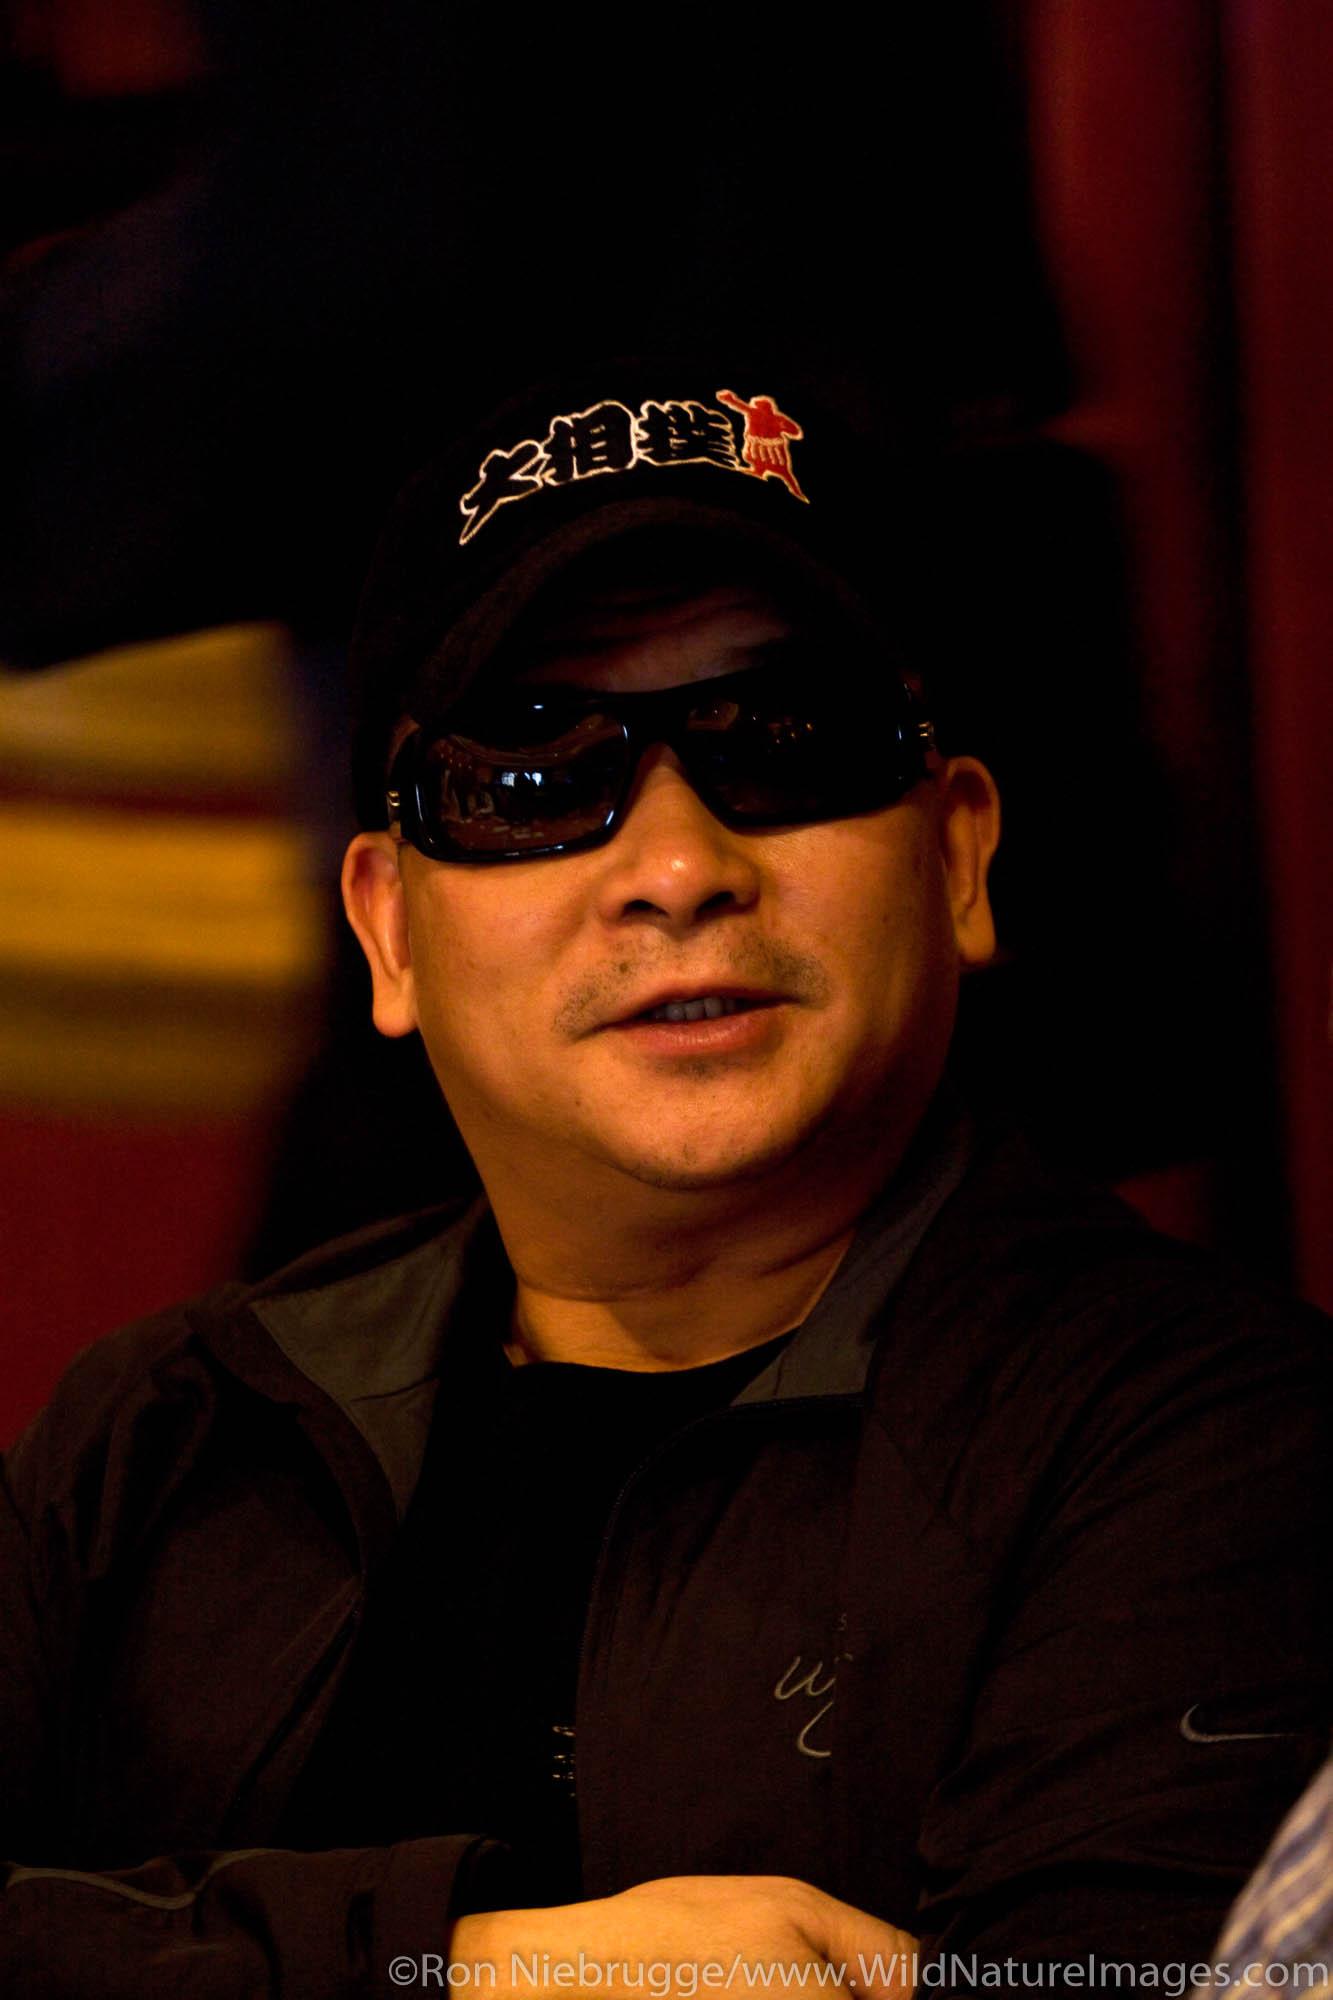 Johnny Chan at the 2008 World Poker Tour Festa Al Lago poker tournament at the Bellagio Resort and Casino, Las Vegas, Nevada.